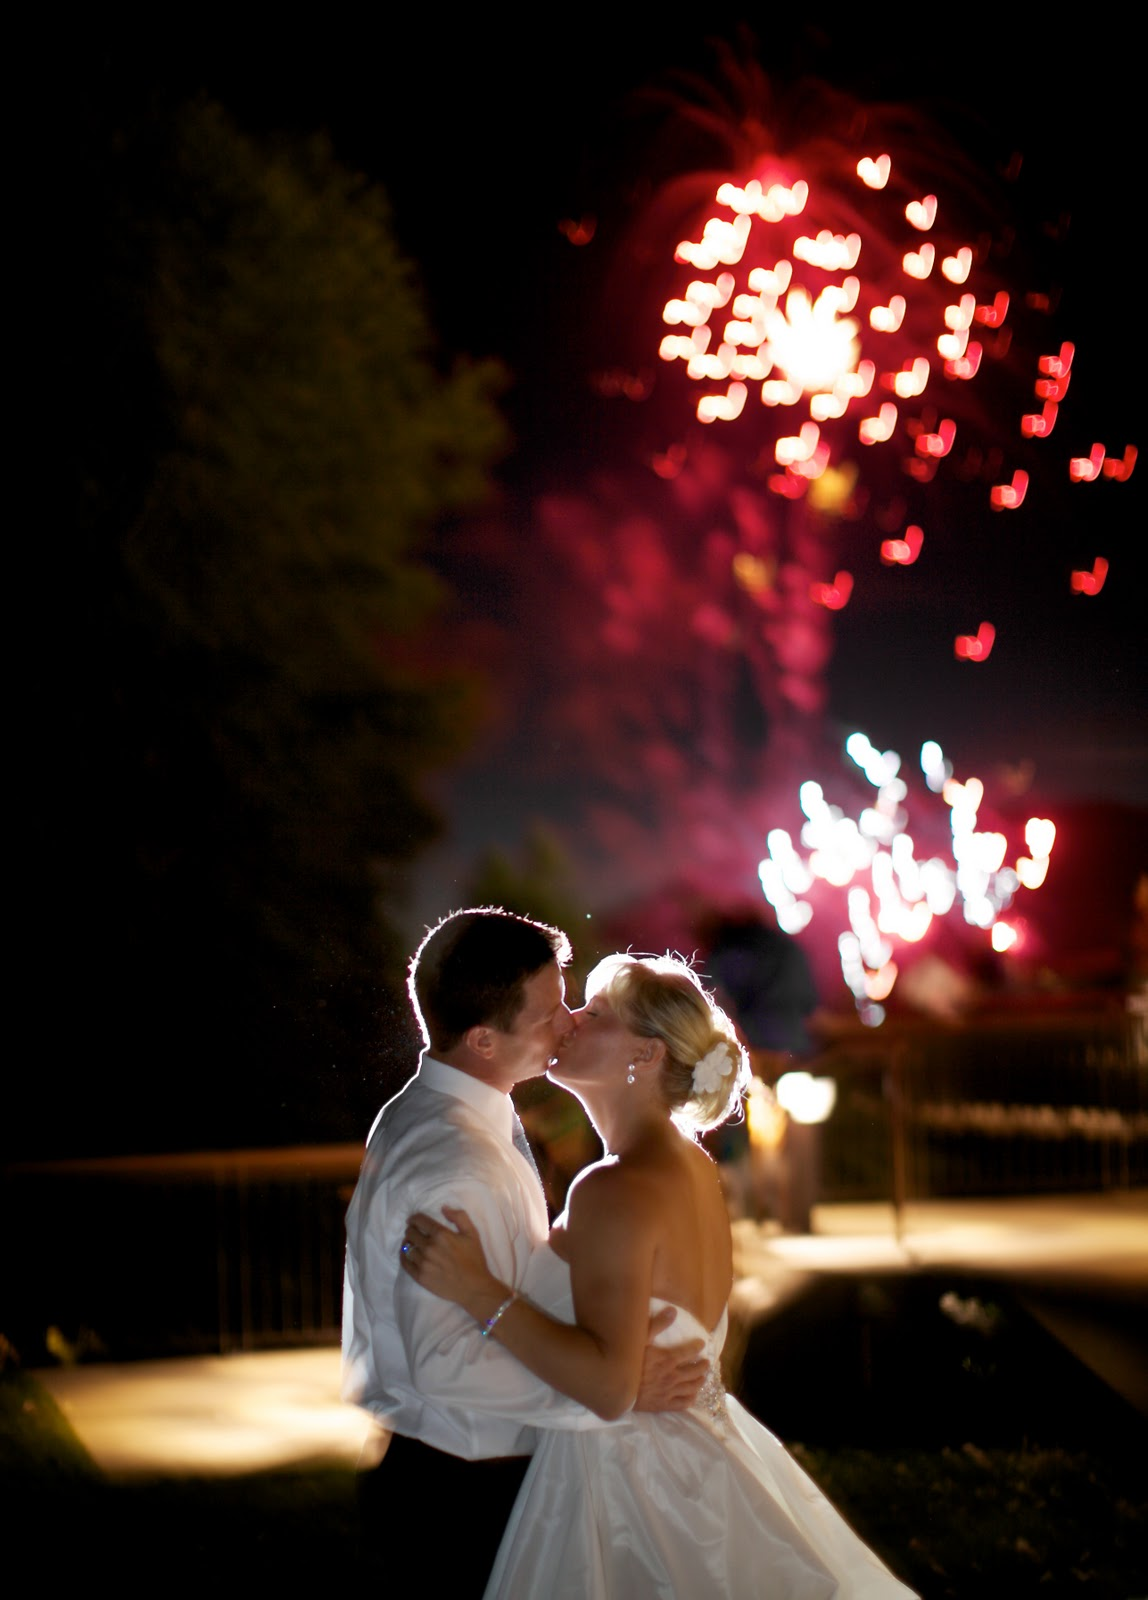 Салют на свадьбе - фото фаер-шоу, красивый фейерверк 59